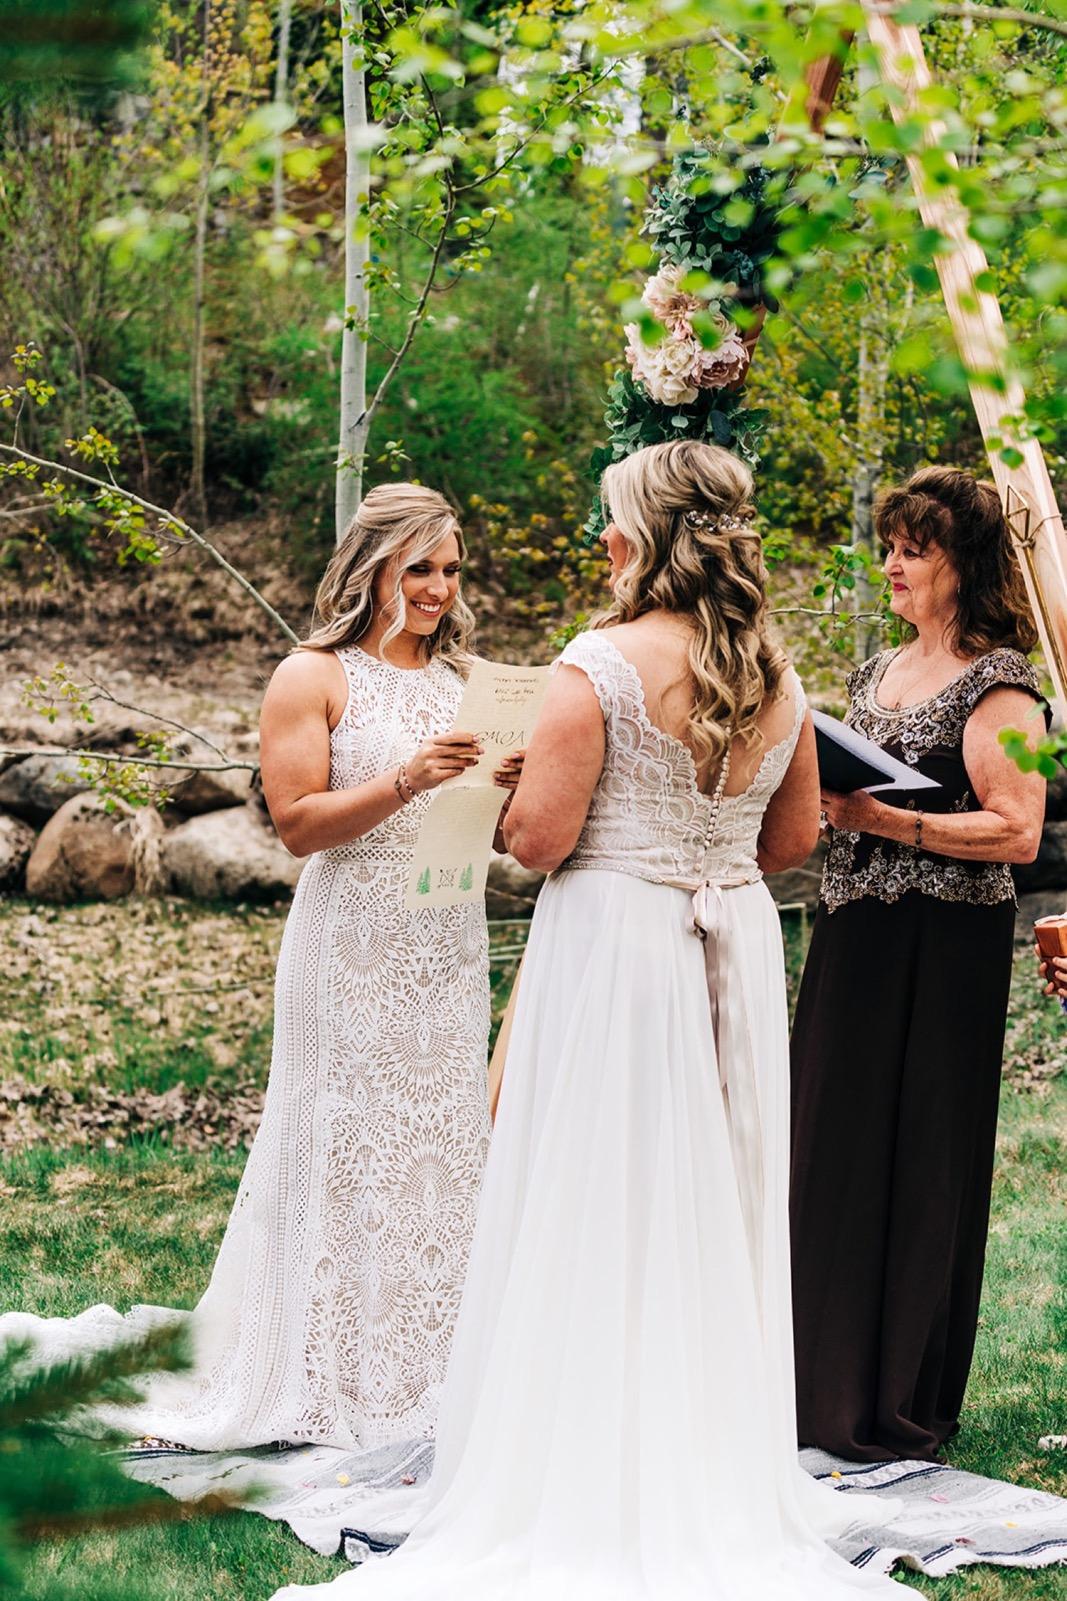 069_falissa_heather_wedding-176.jpg